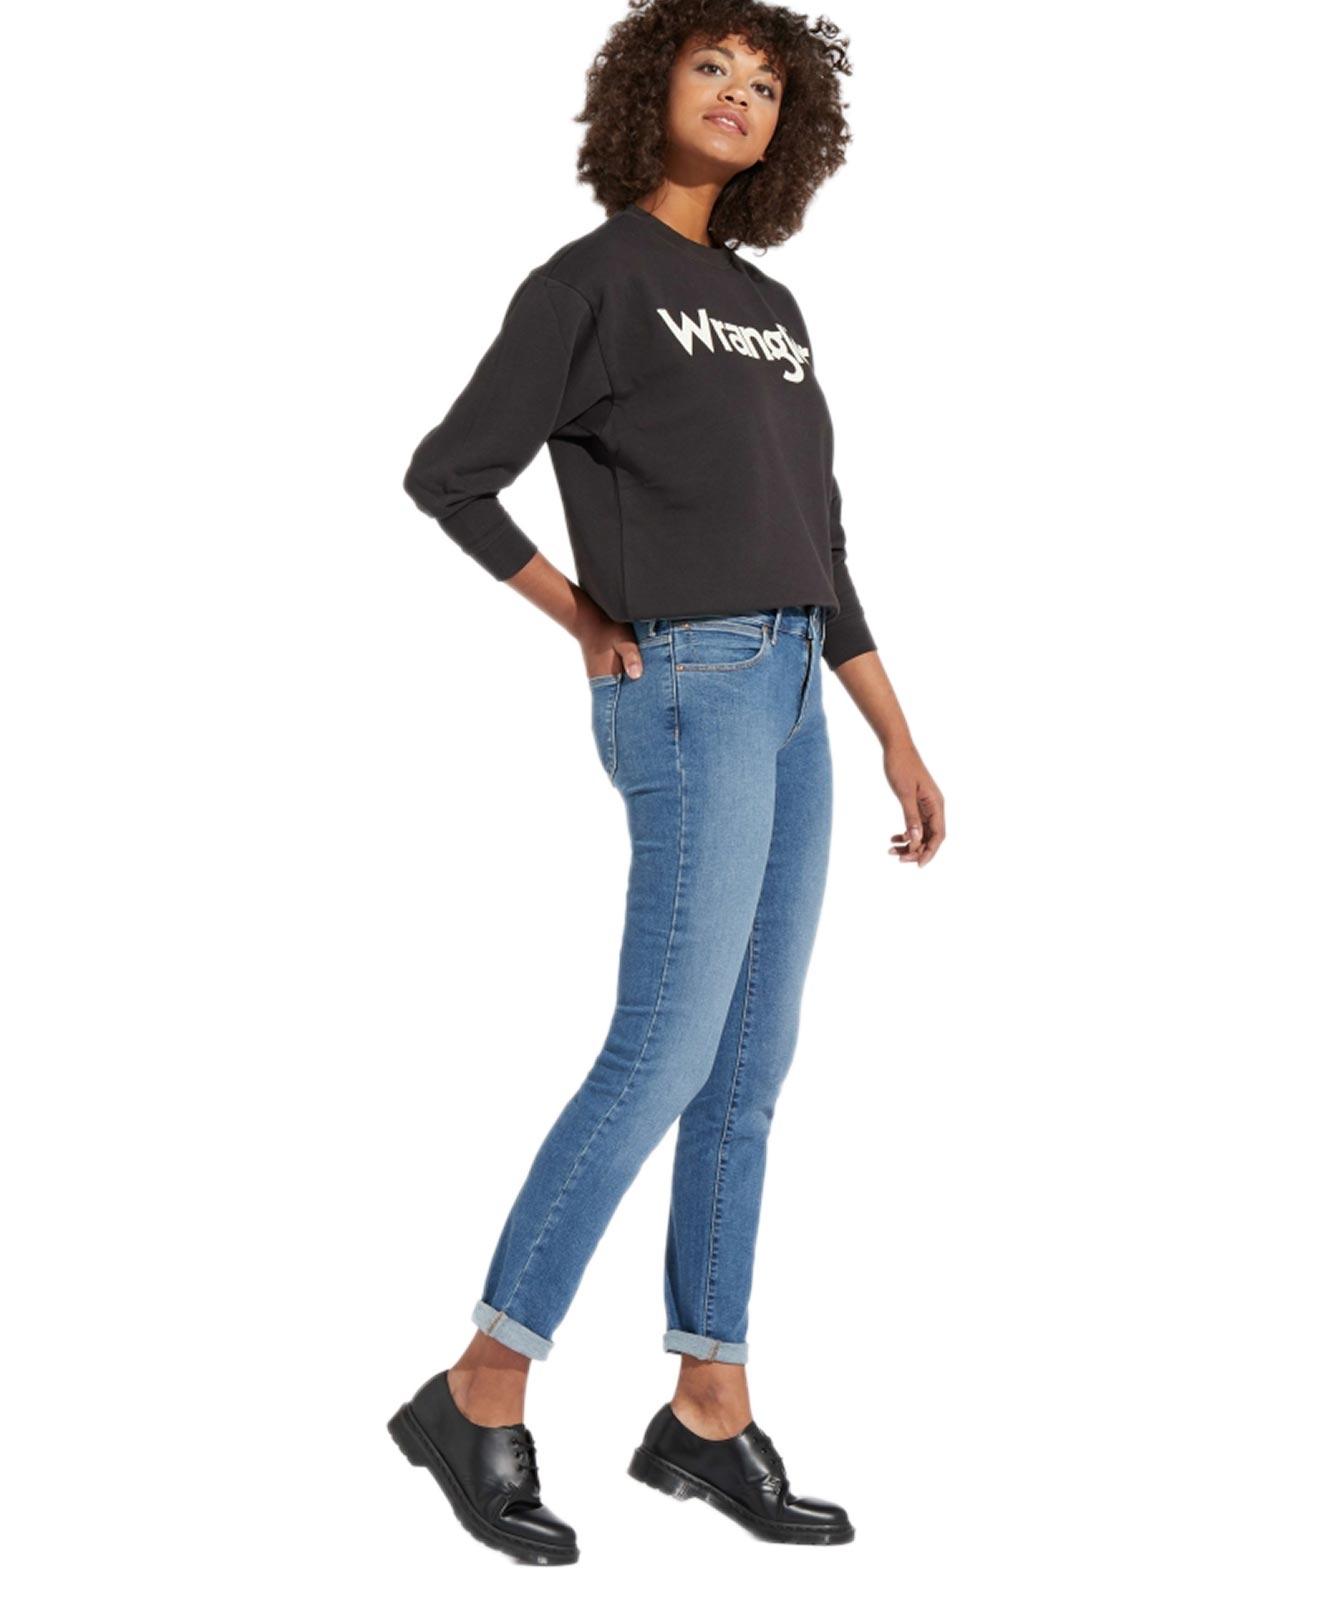 Hosen für Frauen - Wrangler Slim Jeans mit Body Bespoke in hellblau  - Onlineshop Jeans Meile